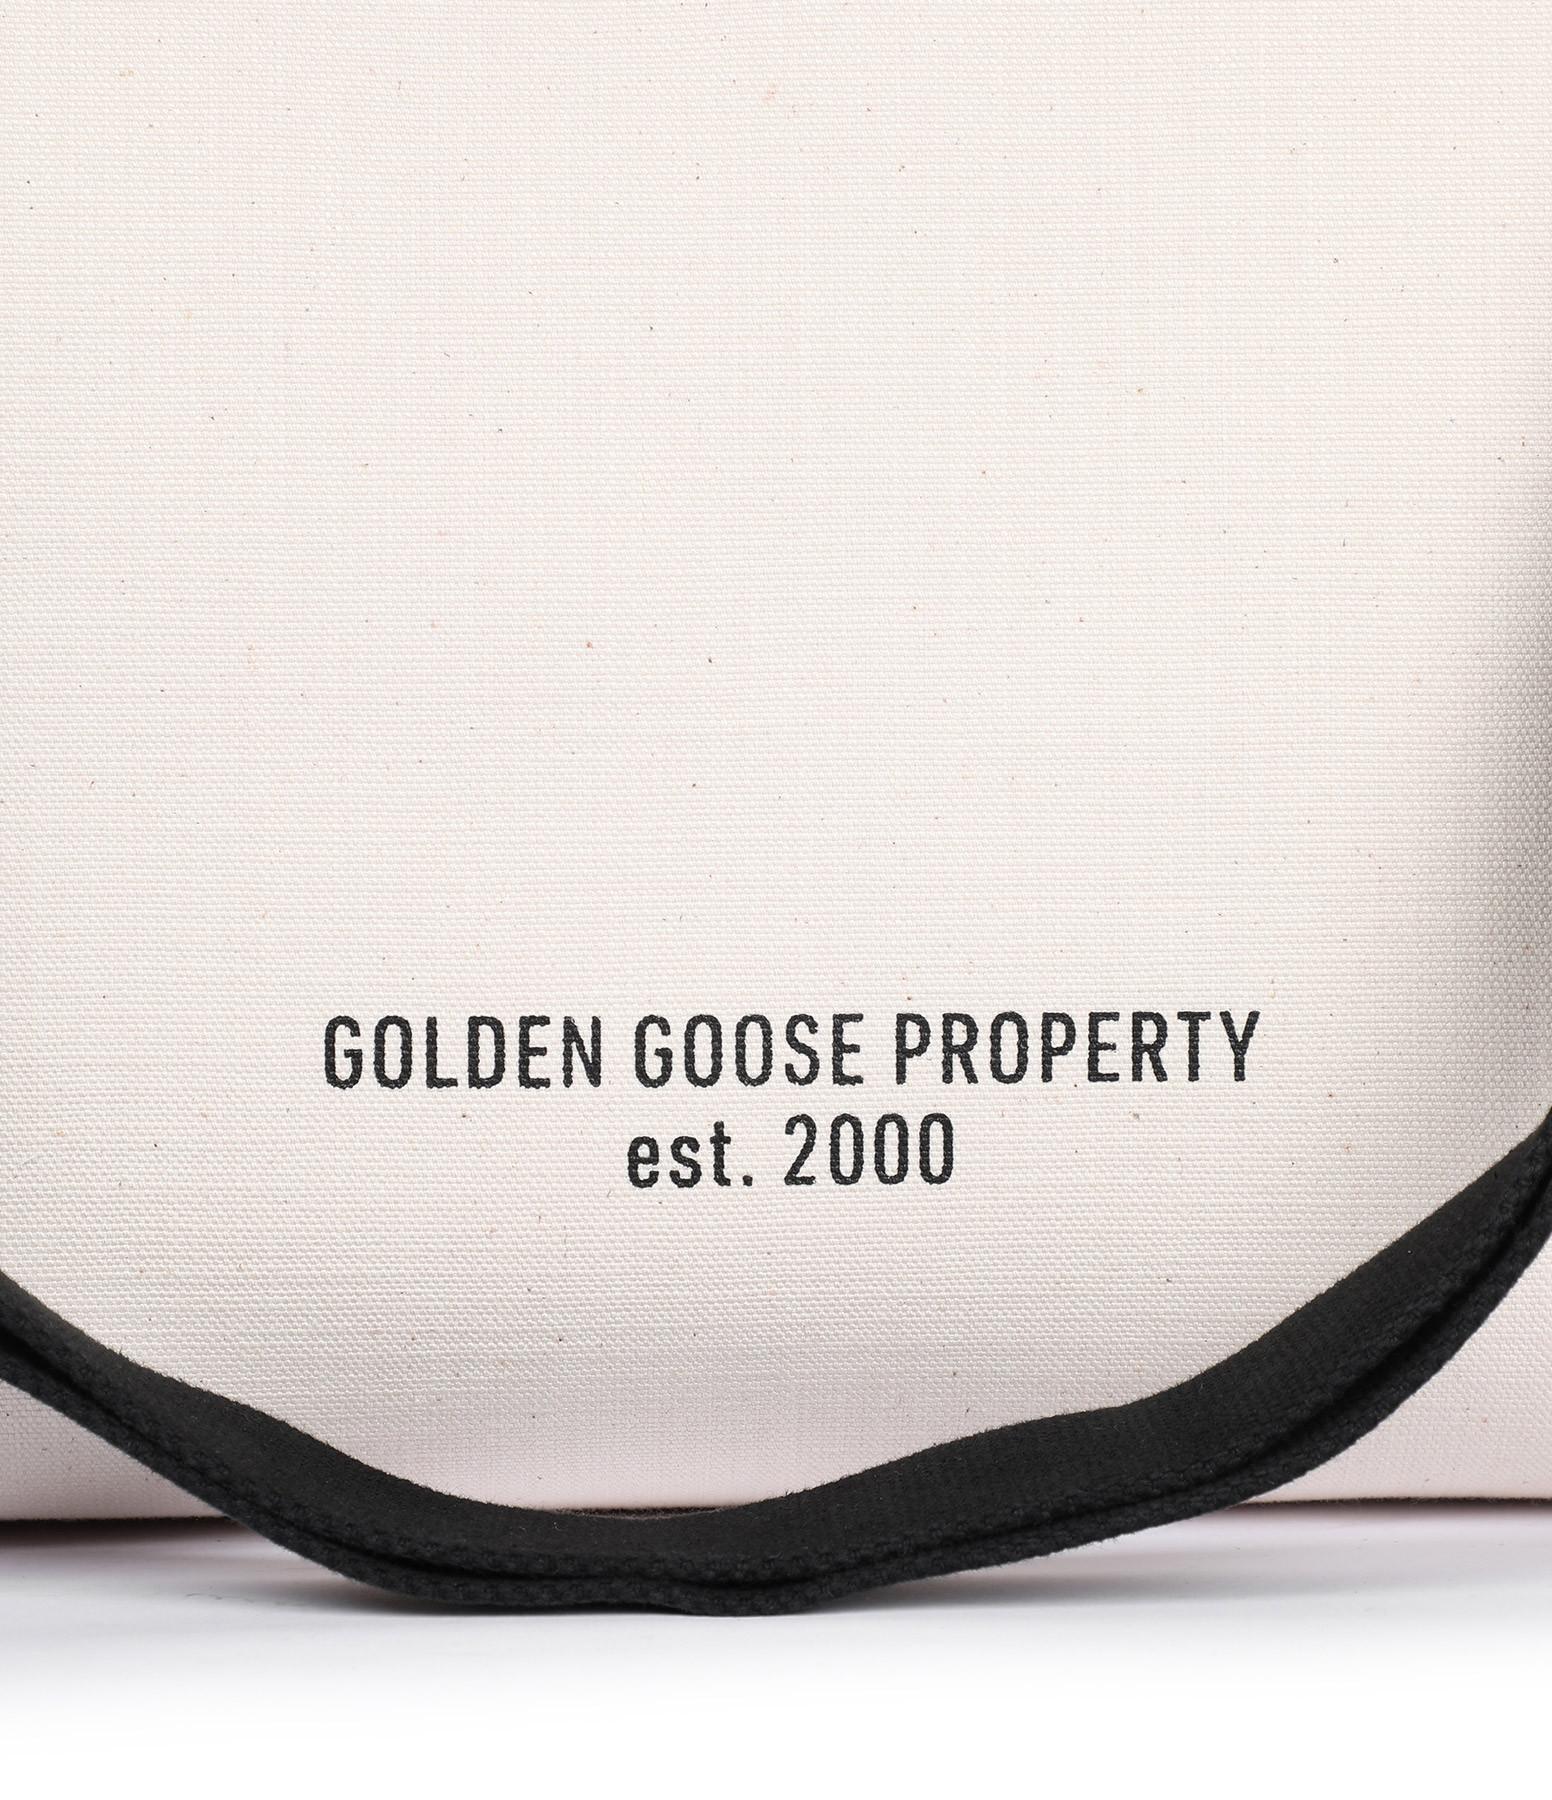 GOLDEN GOOSE - Sac Cabas California Sneakers Toile Naturel